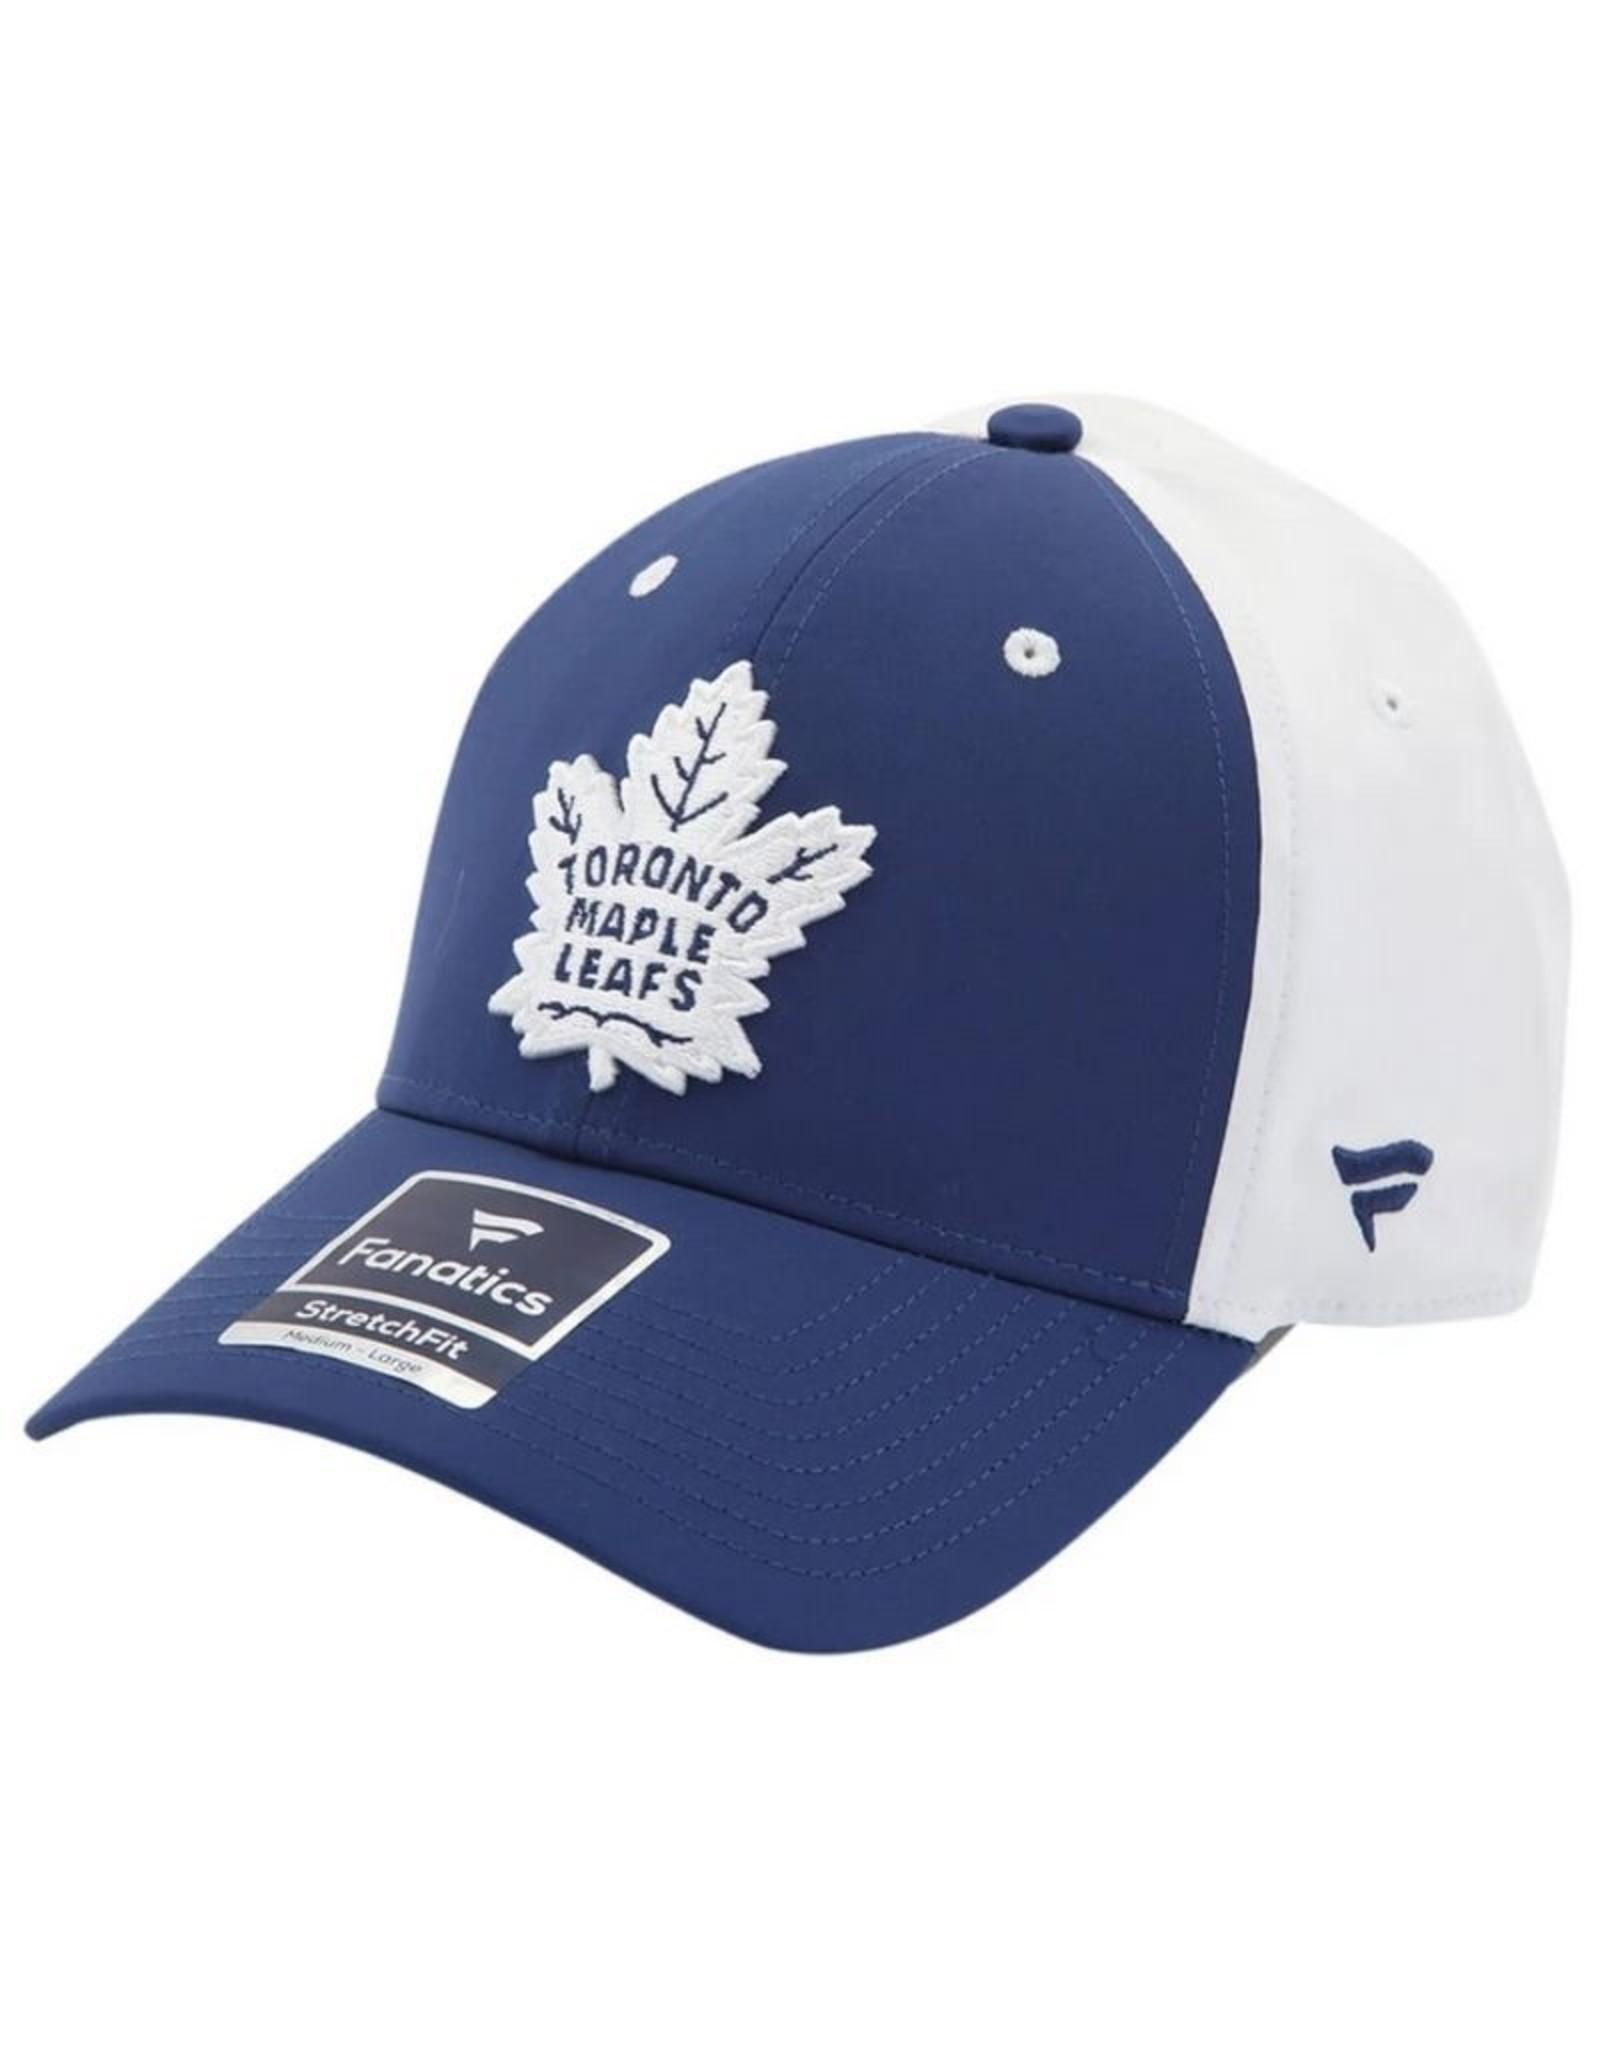 Fanatics Fanatics Iconic Men's Stretch Hat Toronto Maple Leafs Blue/White